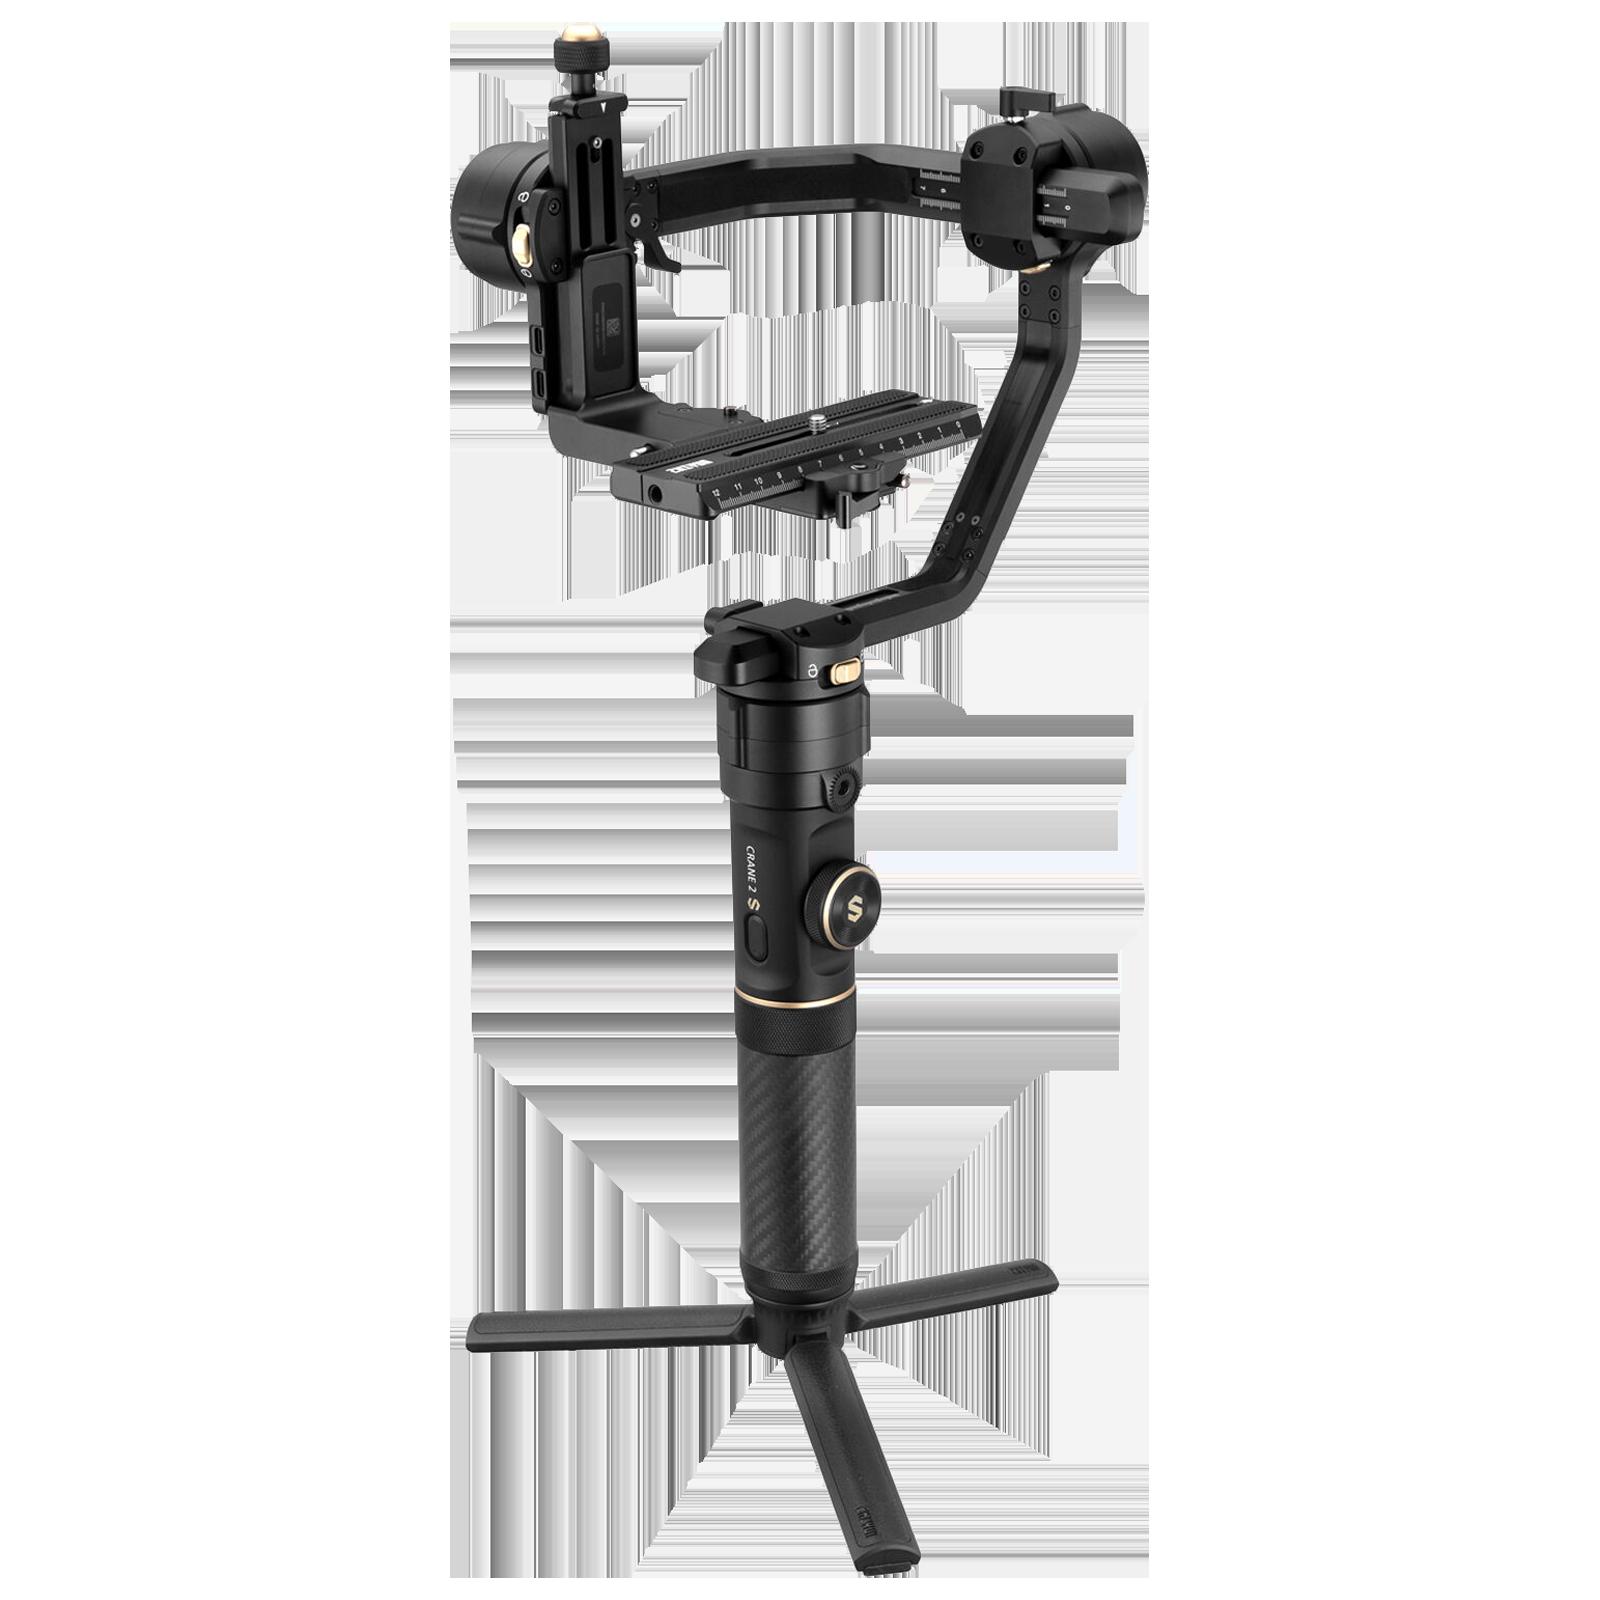 Zhiyun Crane 2S Gimbal ForDSLR Camera and Mirrorless Camera (Axis Locking Mechanism 2.0, ZH.00000008.01, Black)_1